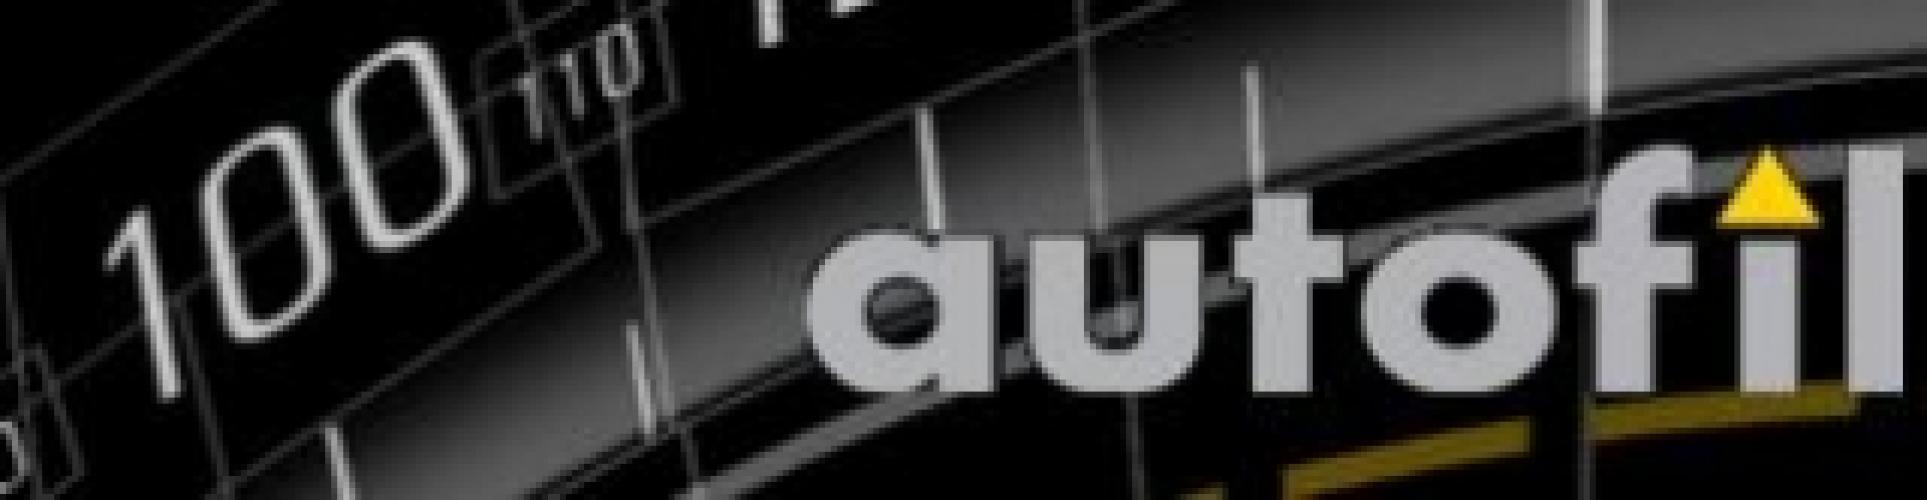 Autofil next episode air date poster